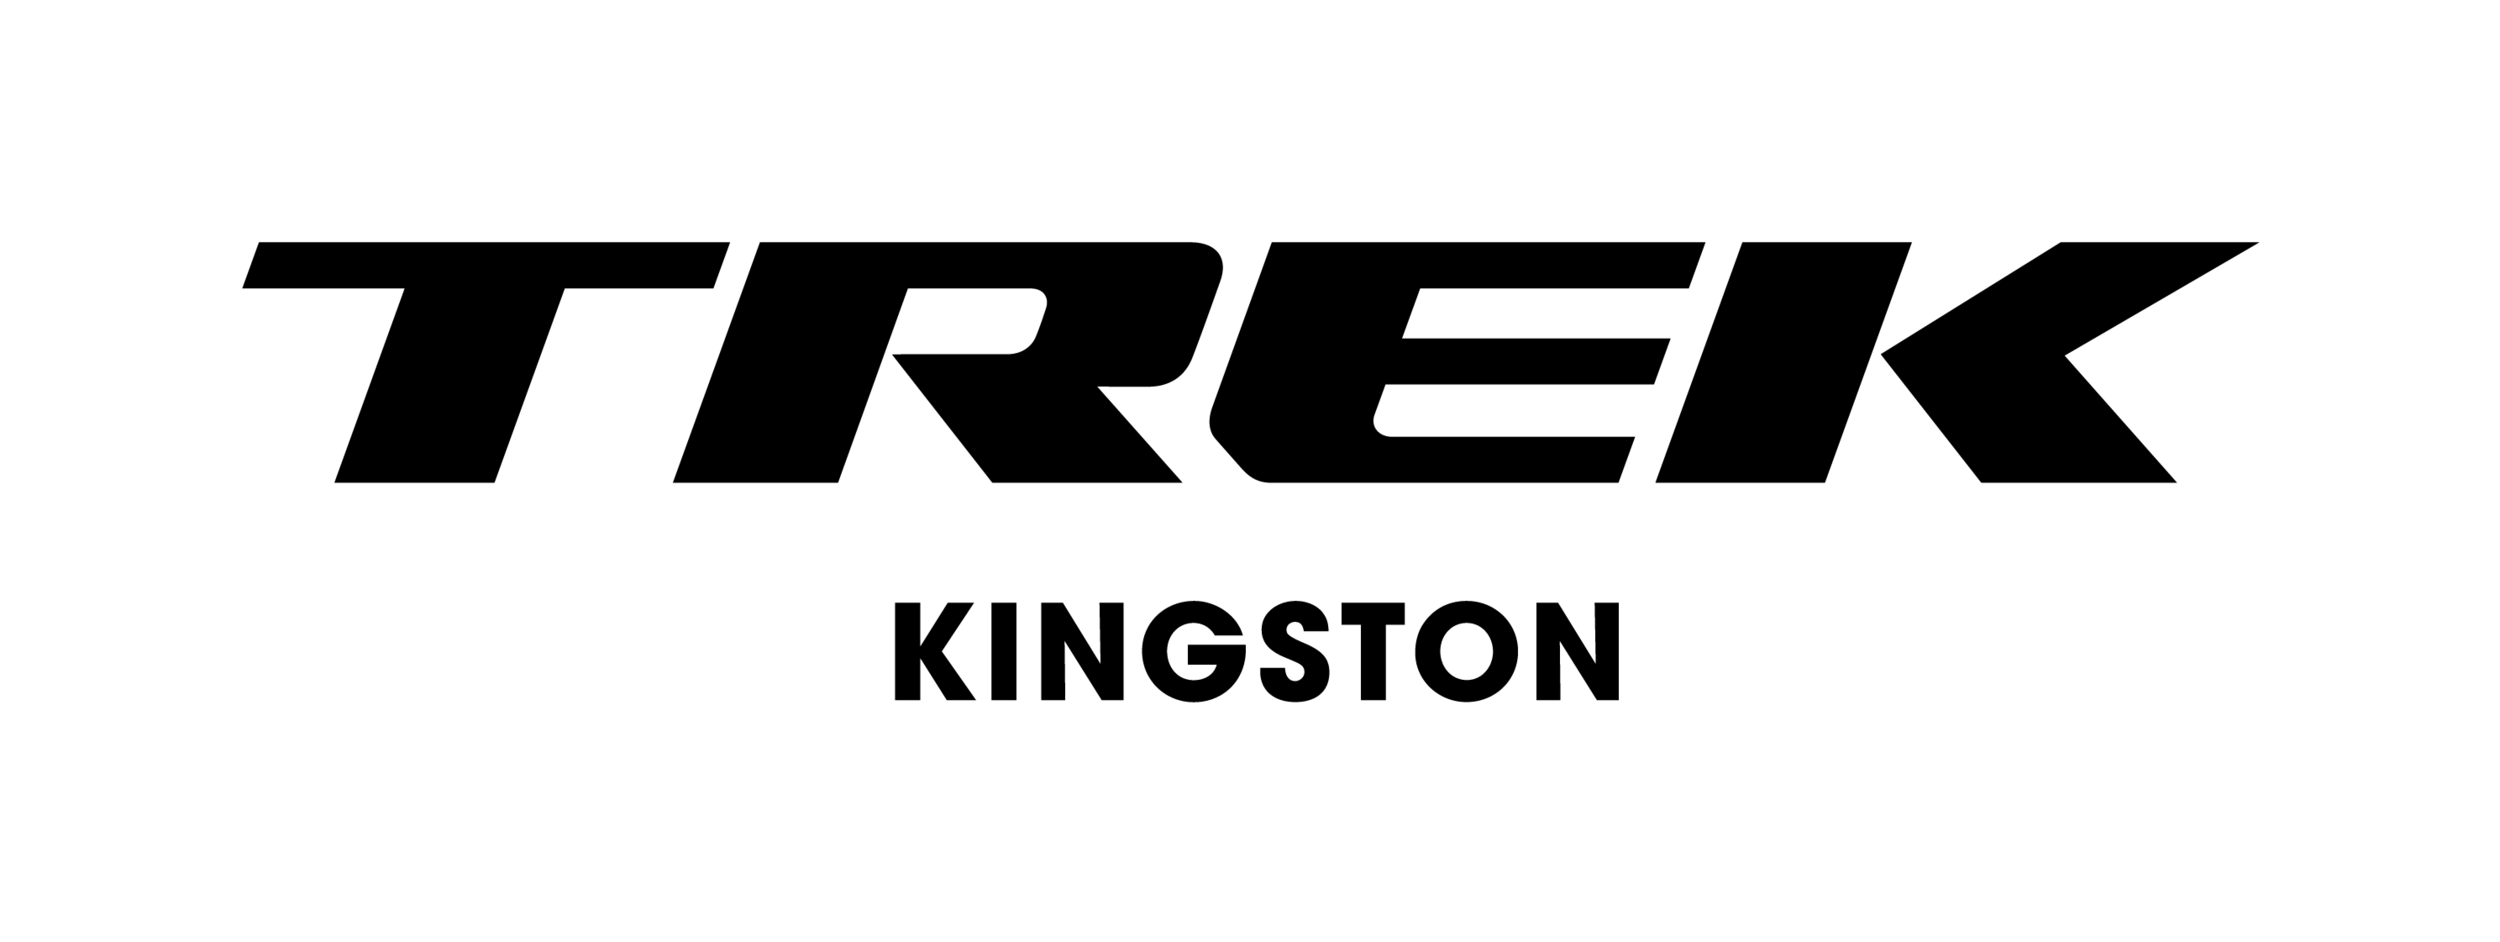 Trek_logo_location_Kingston_black.png